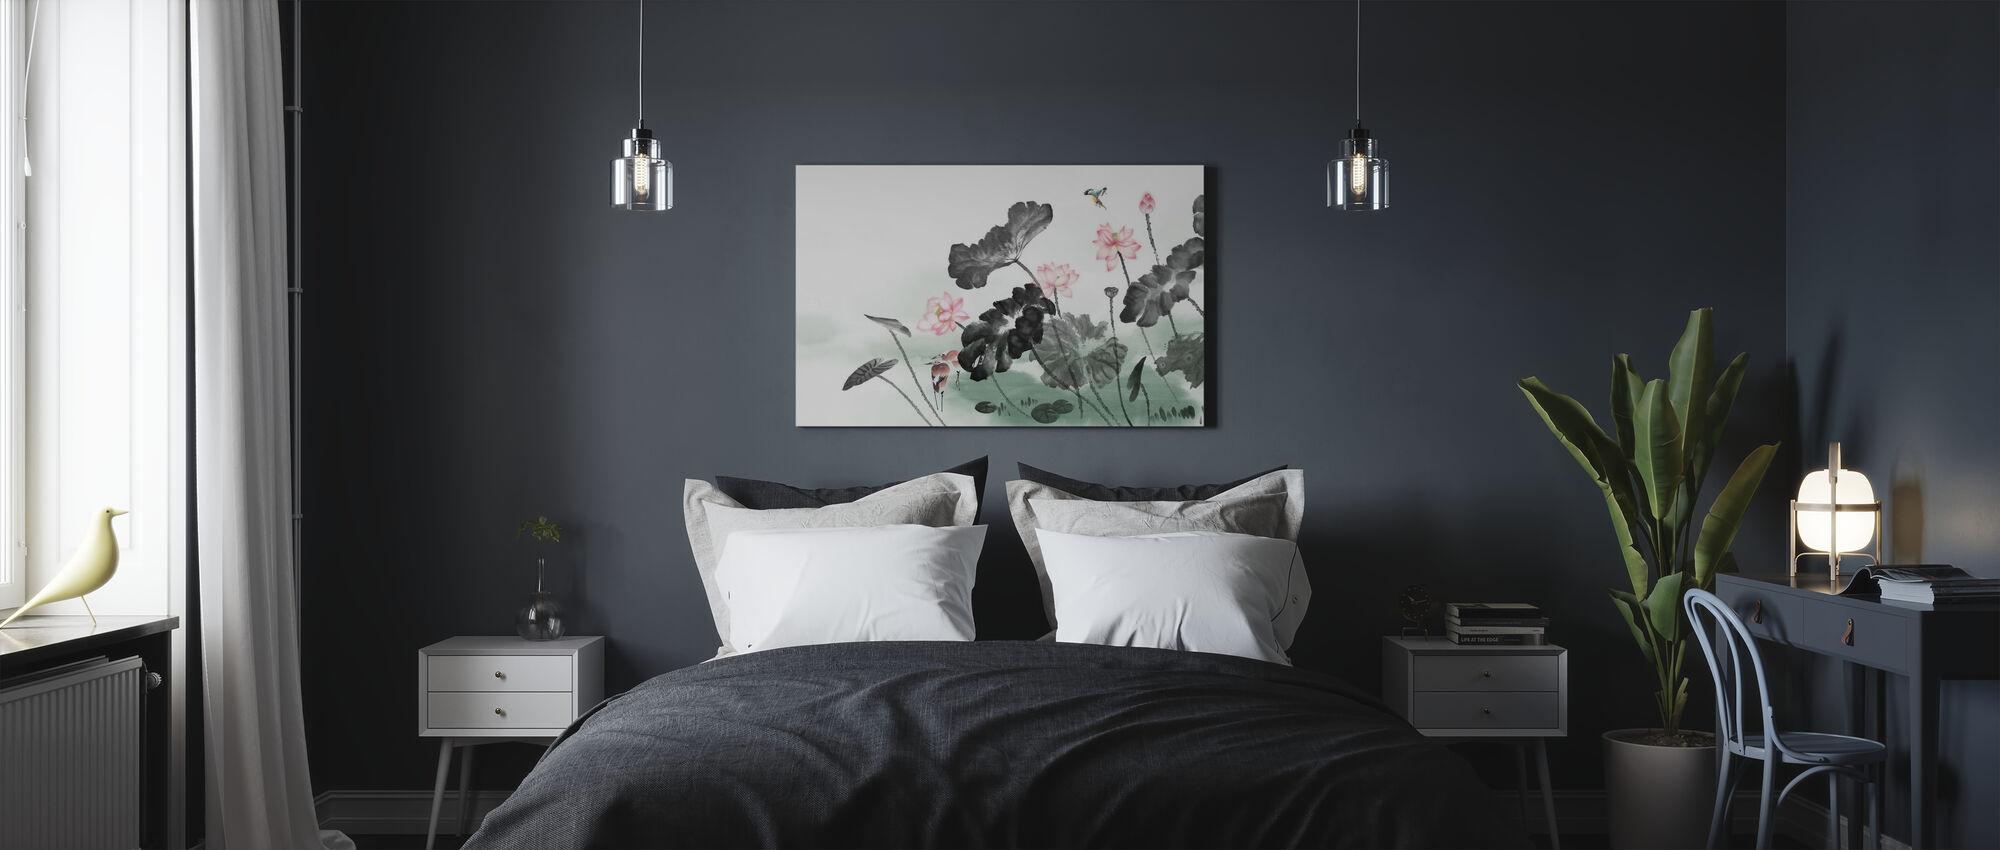 La Felur - Canvas print - Bedroom